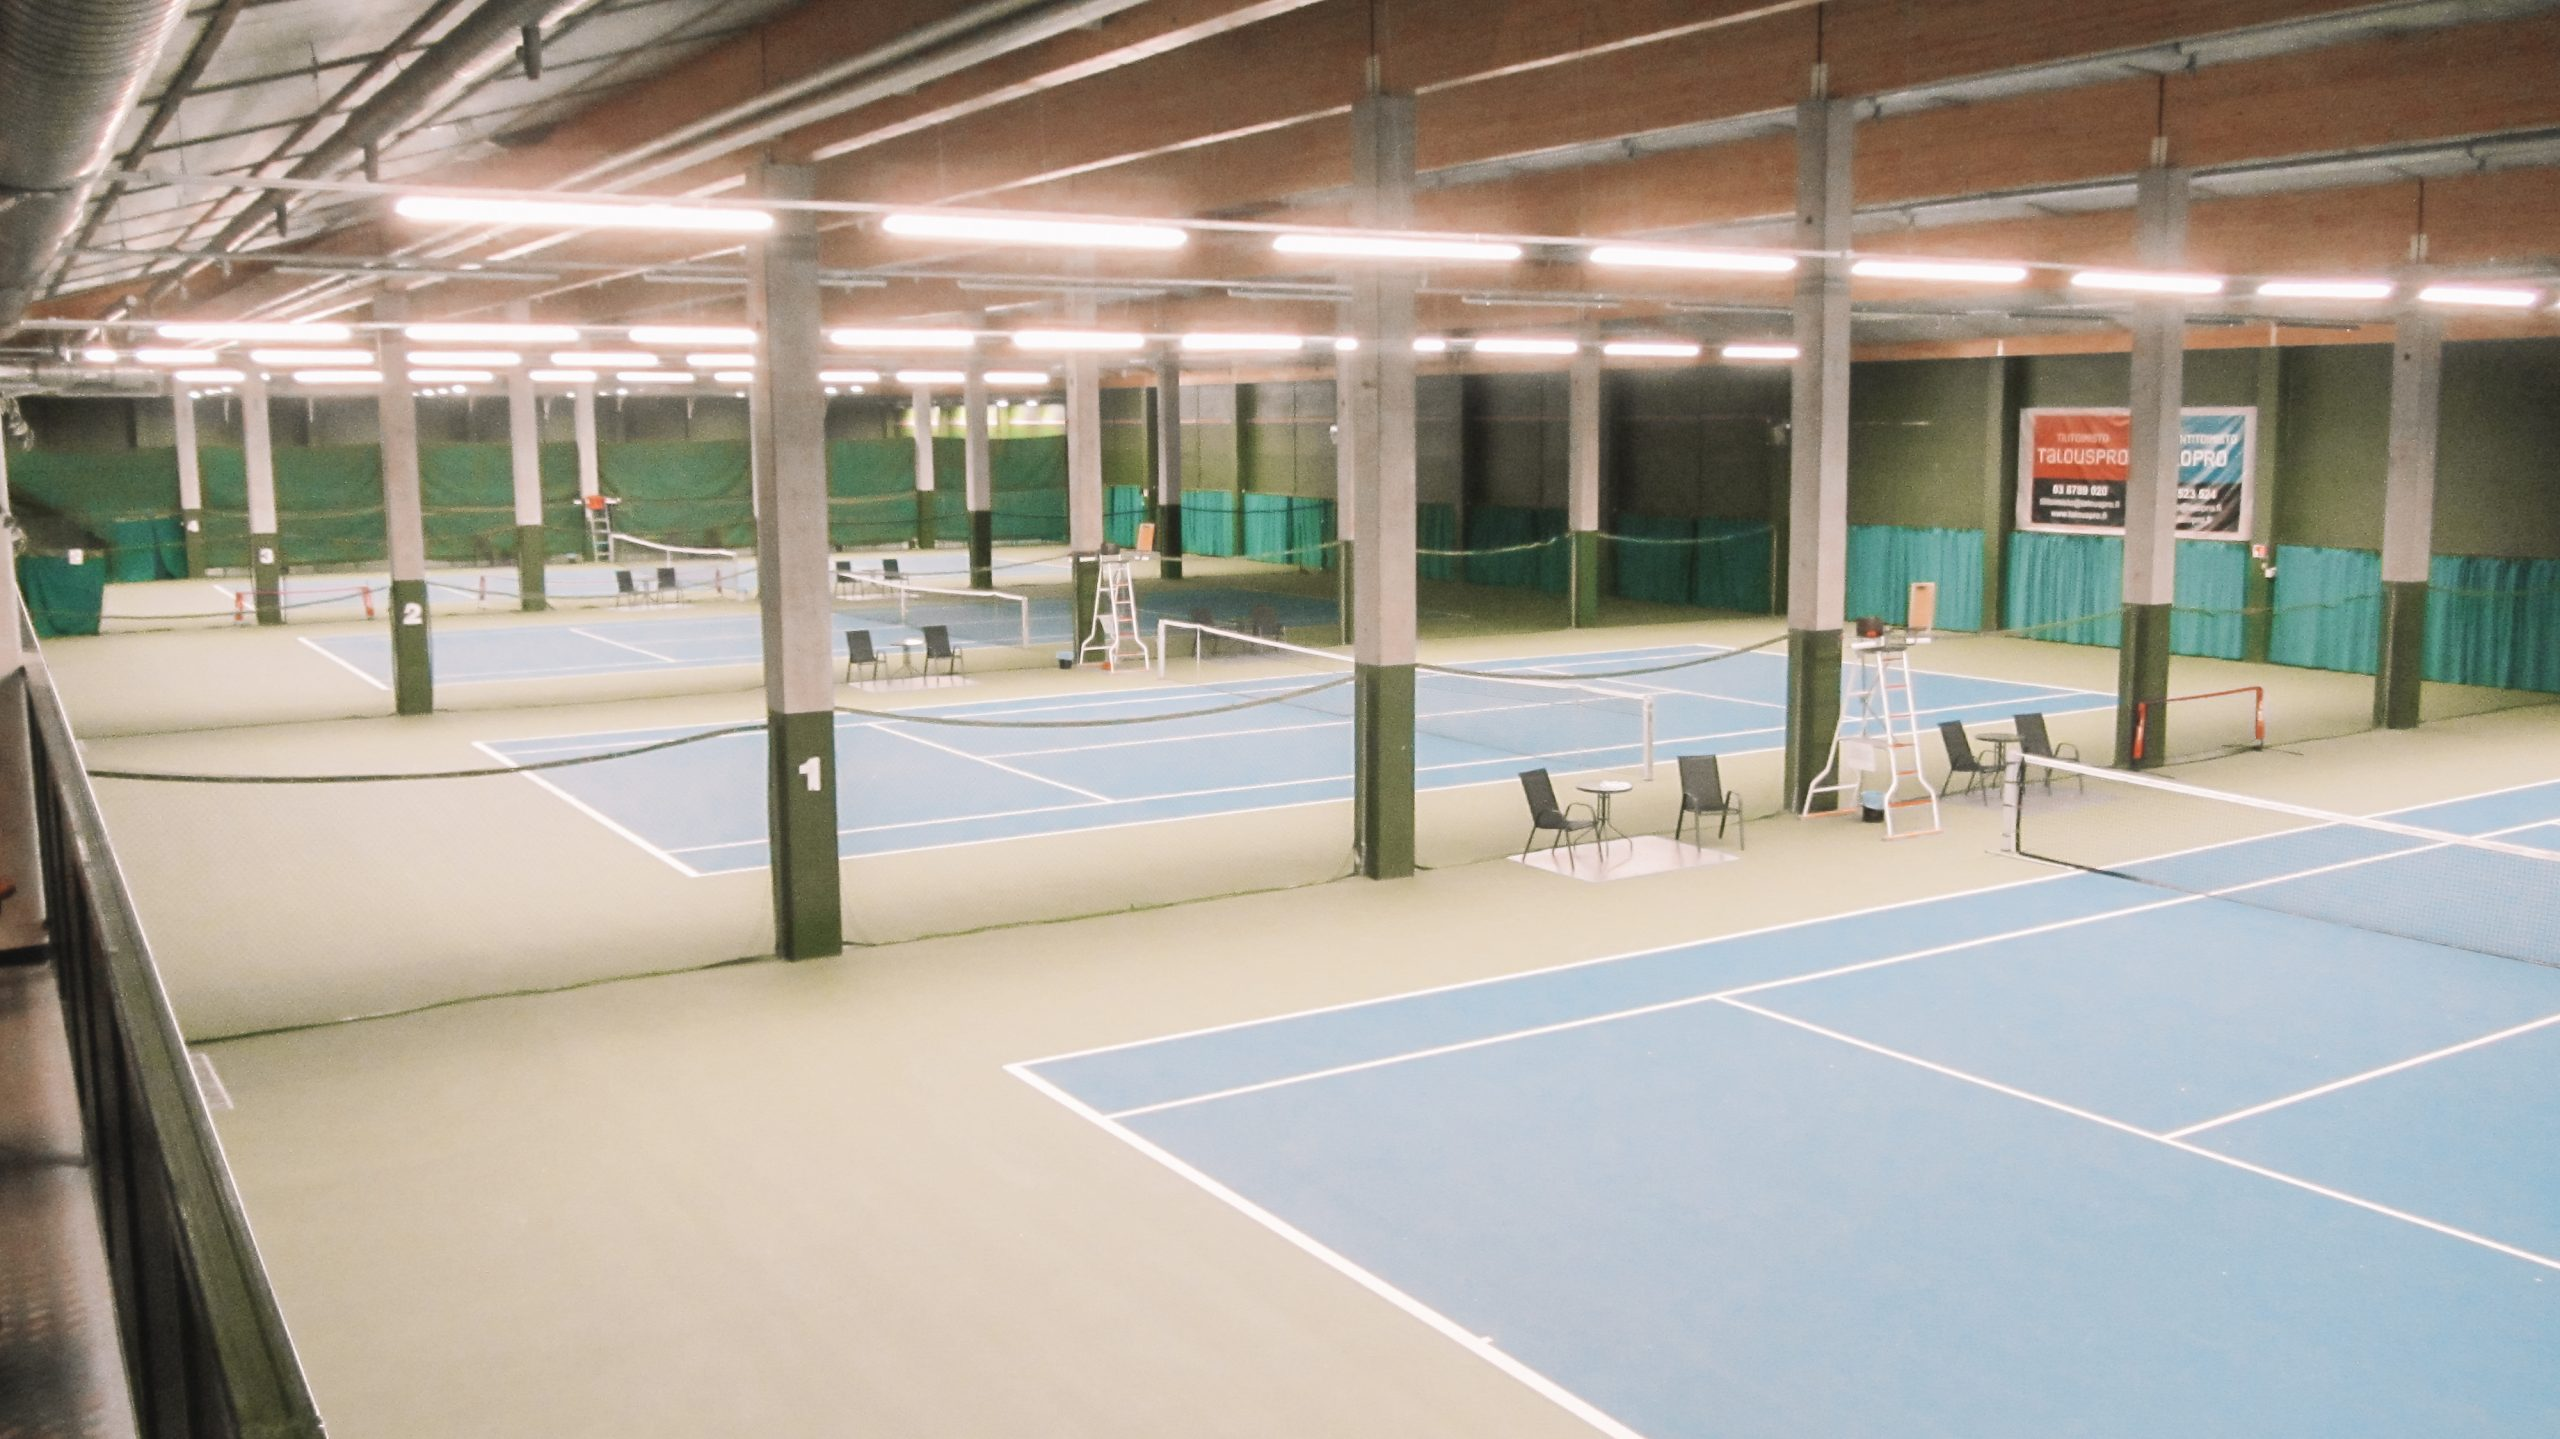 Lahden Tennis Ja Squashkeskus